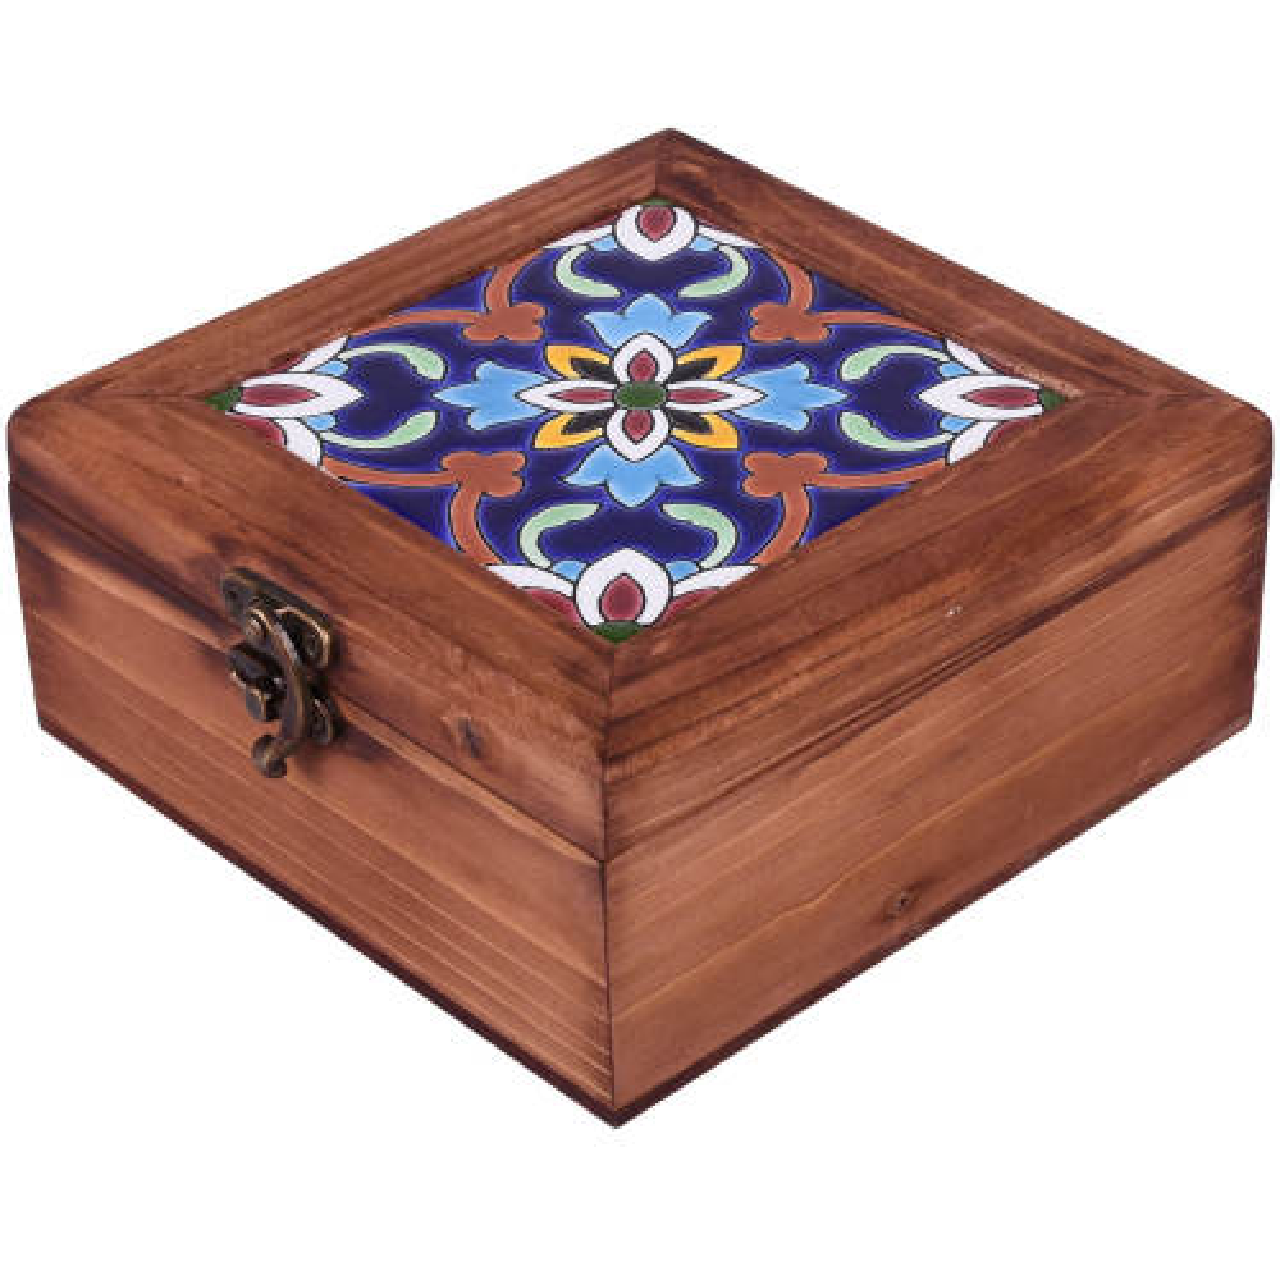 جعبه هدیه طرح نارگل کد 16-01